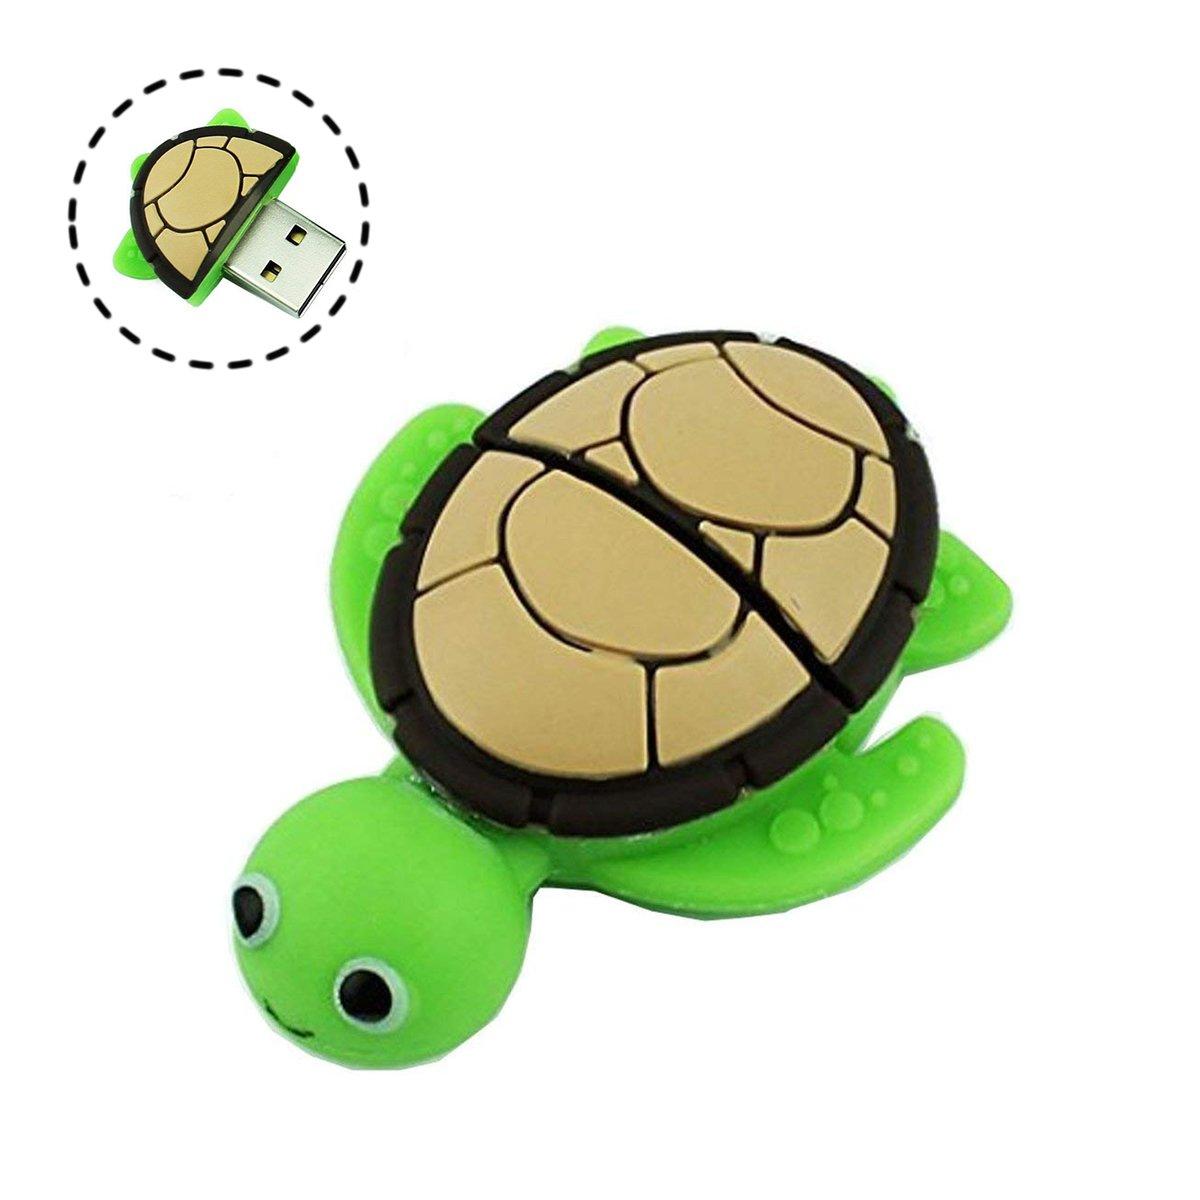 Novelty Tortoise Shape Design 16GB USB 2.0 Flash Drive Cute Memory Stick Sea Turtle Thumb Drive Data Storage Pendrive Cartoon Jump Drive Gift (tortoise-16GB) by QICAIHU (Image #1)